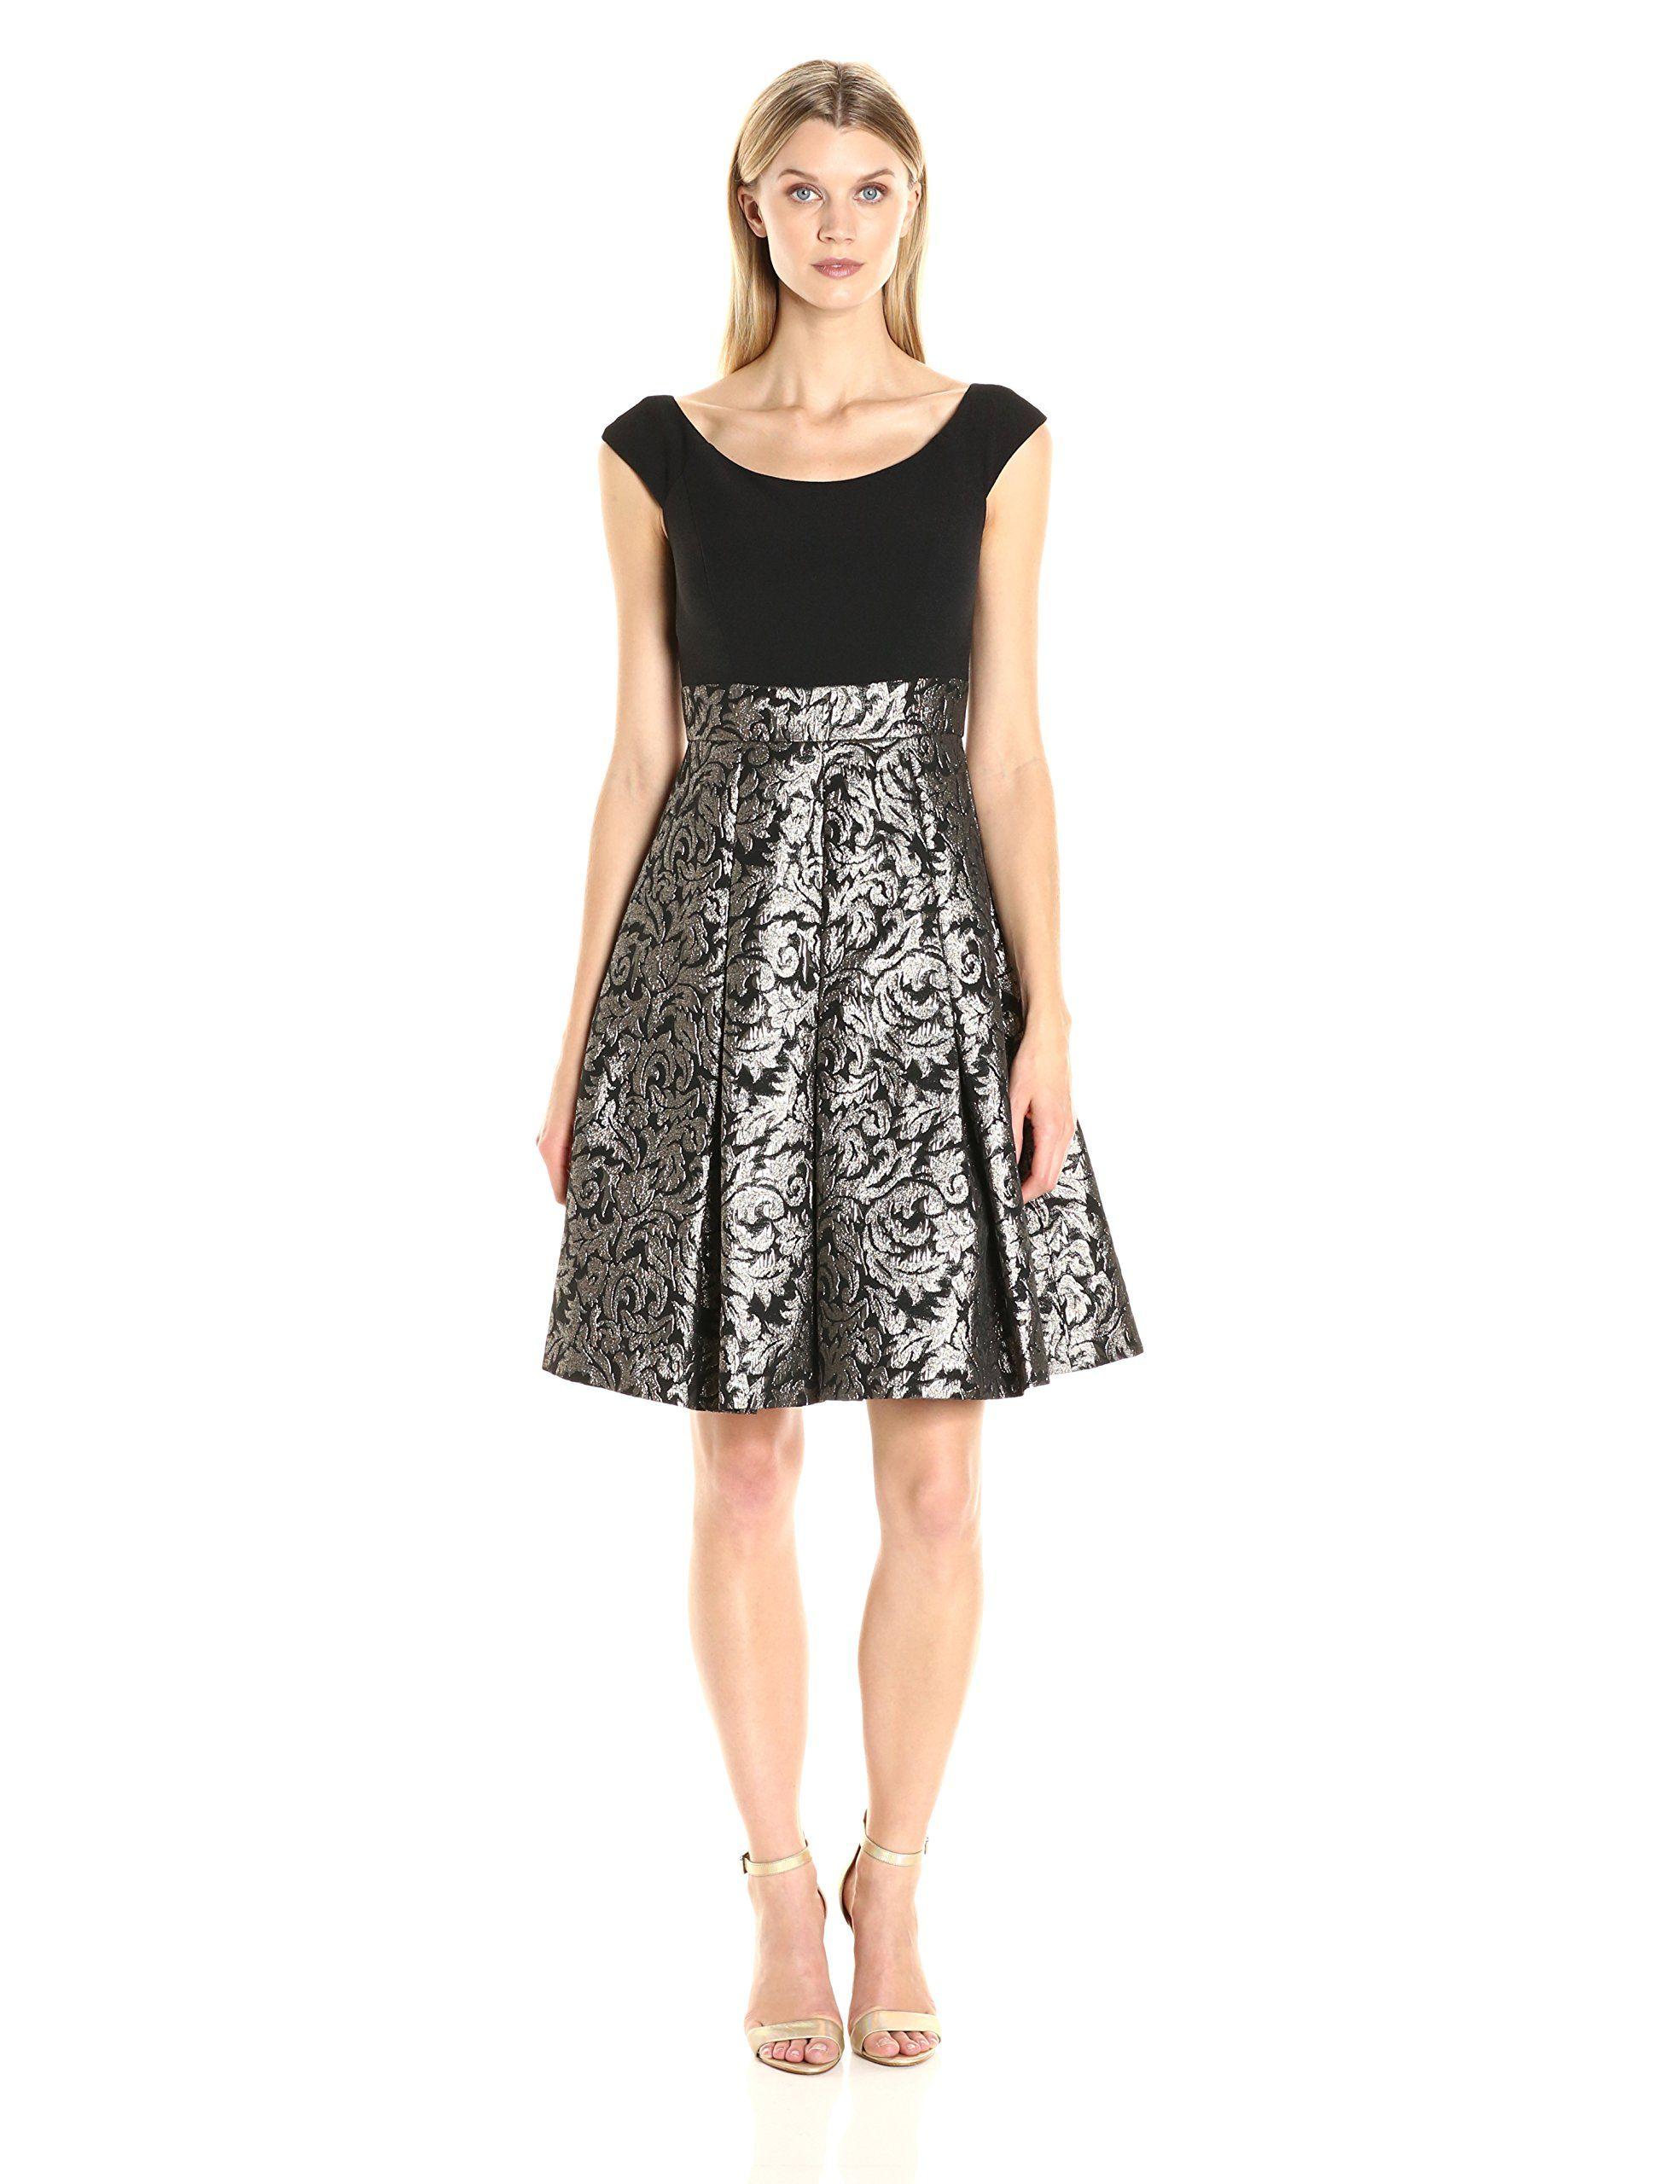 Eliza J Women's Cap Sleeve Fit and Flare Dress, Black/Gold, 14 ...